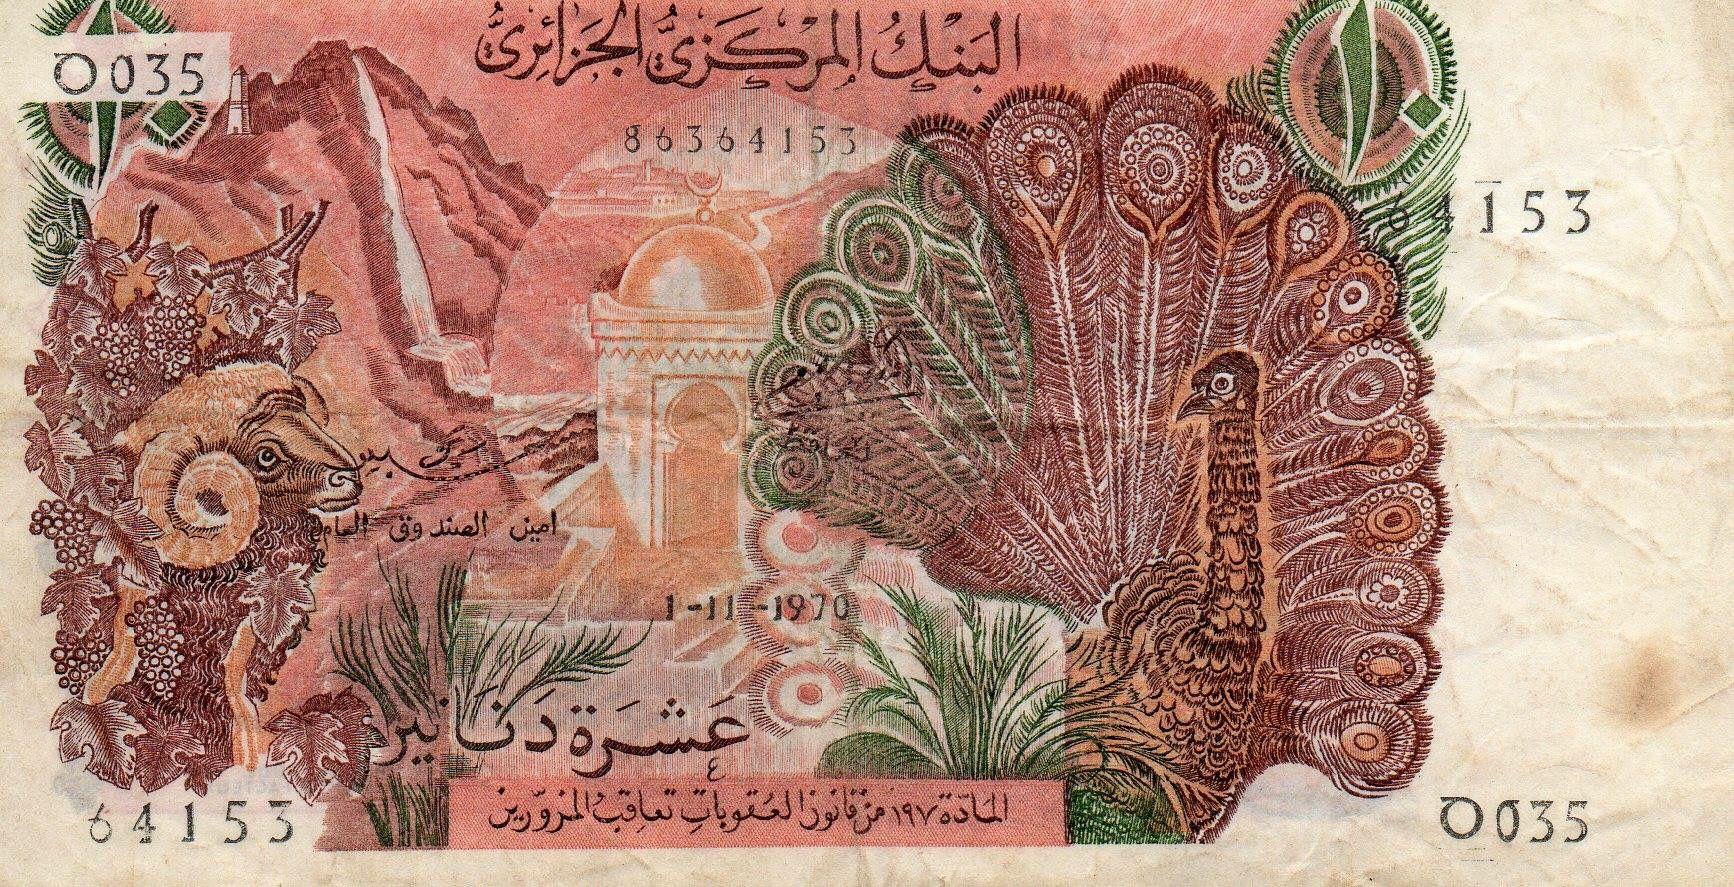 10 Dinars 1970 (Av). #Argelia #Papermoney #Dinero